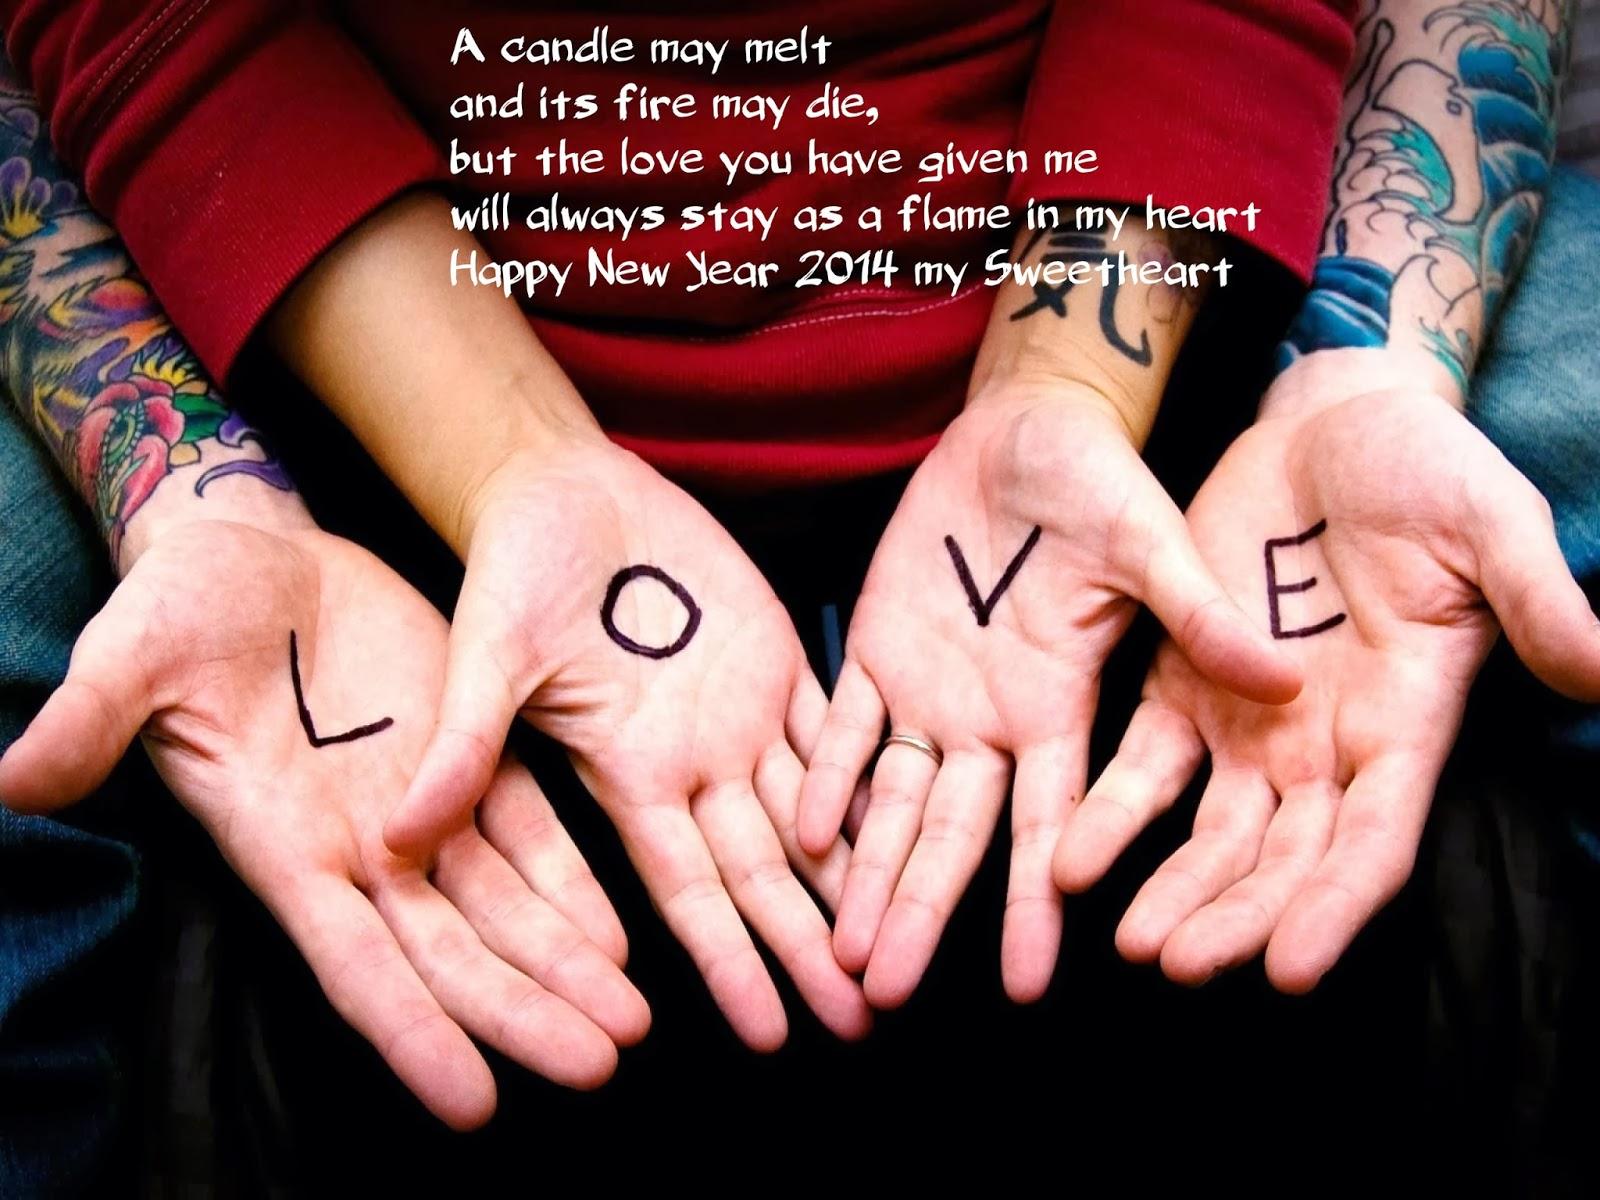 new year romantic love sms shayari for sweetheart girlfriend